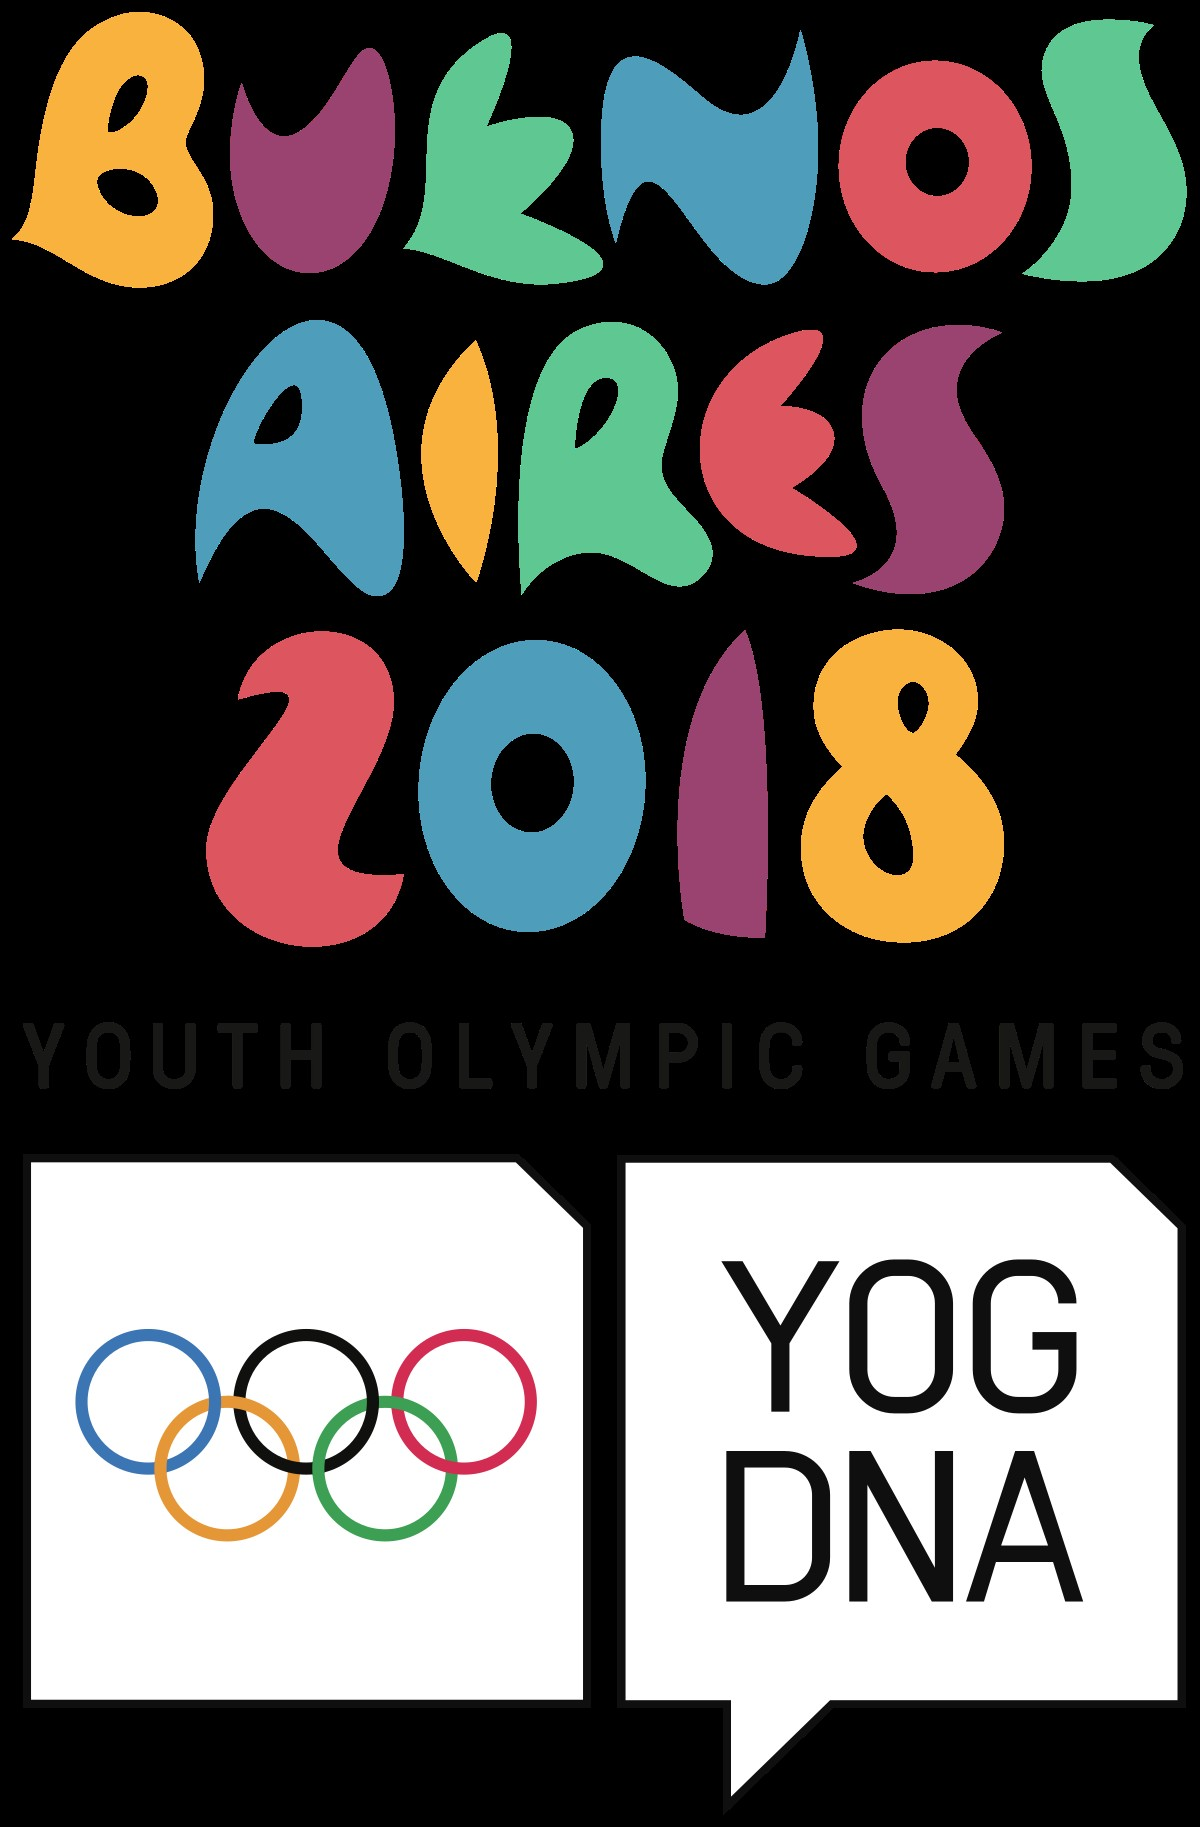 Calendario 2019 Feriados Republica Dominicana Más Reciente 2018 Summer Youth Olympics Of Calendario 2019 Feriados Republica Dominicana Más Reciente Calendario A±o 2019